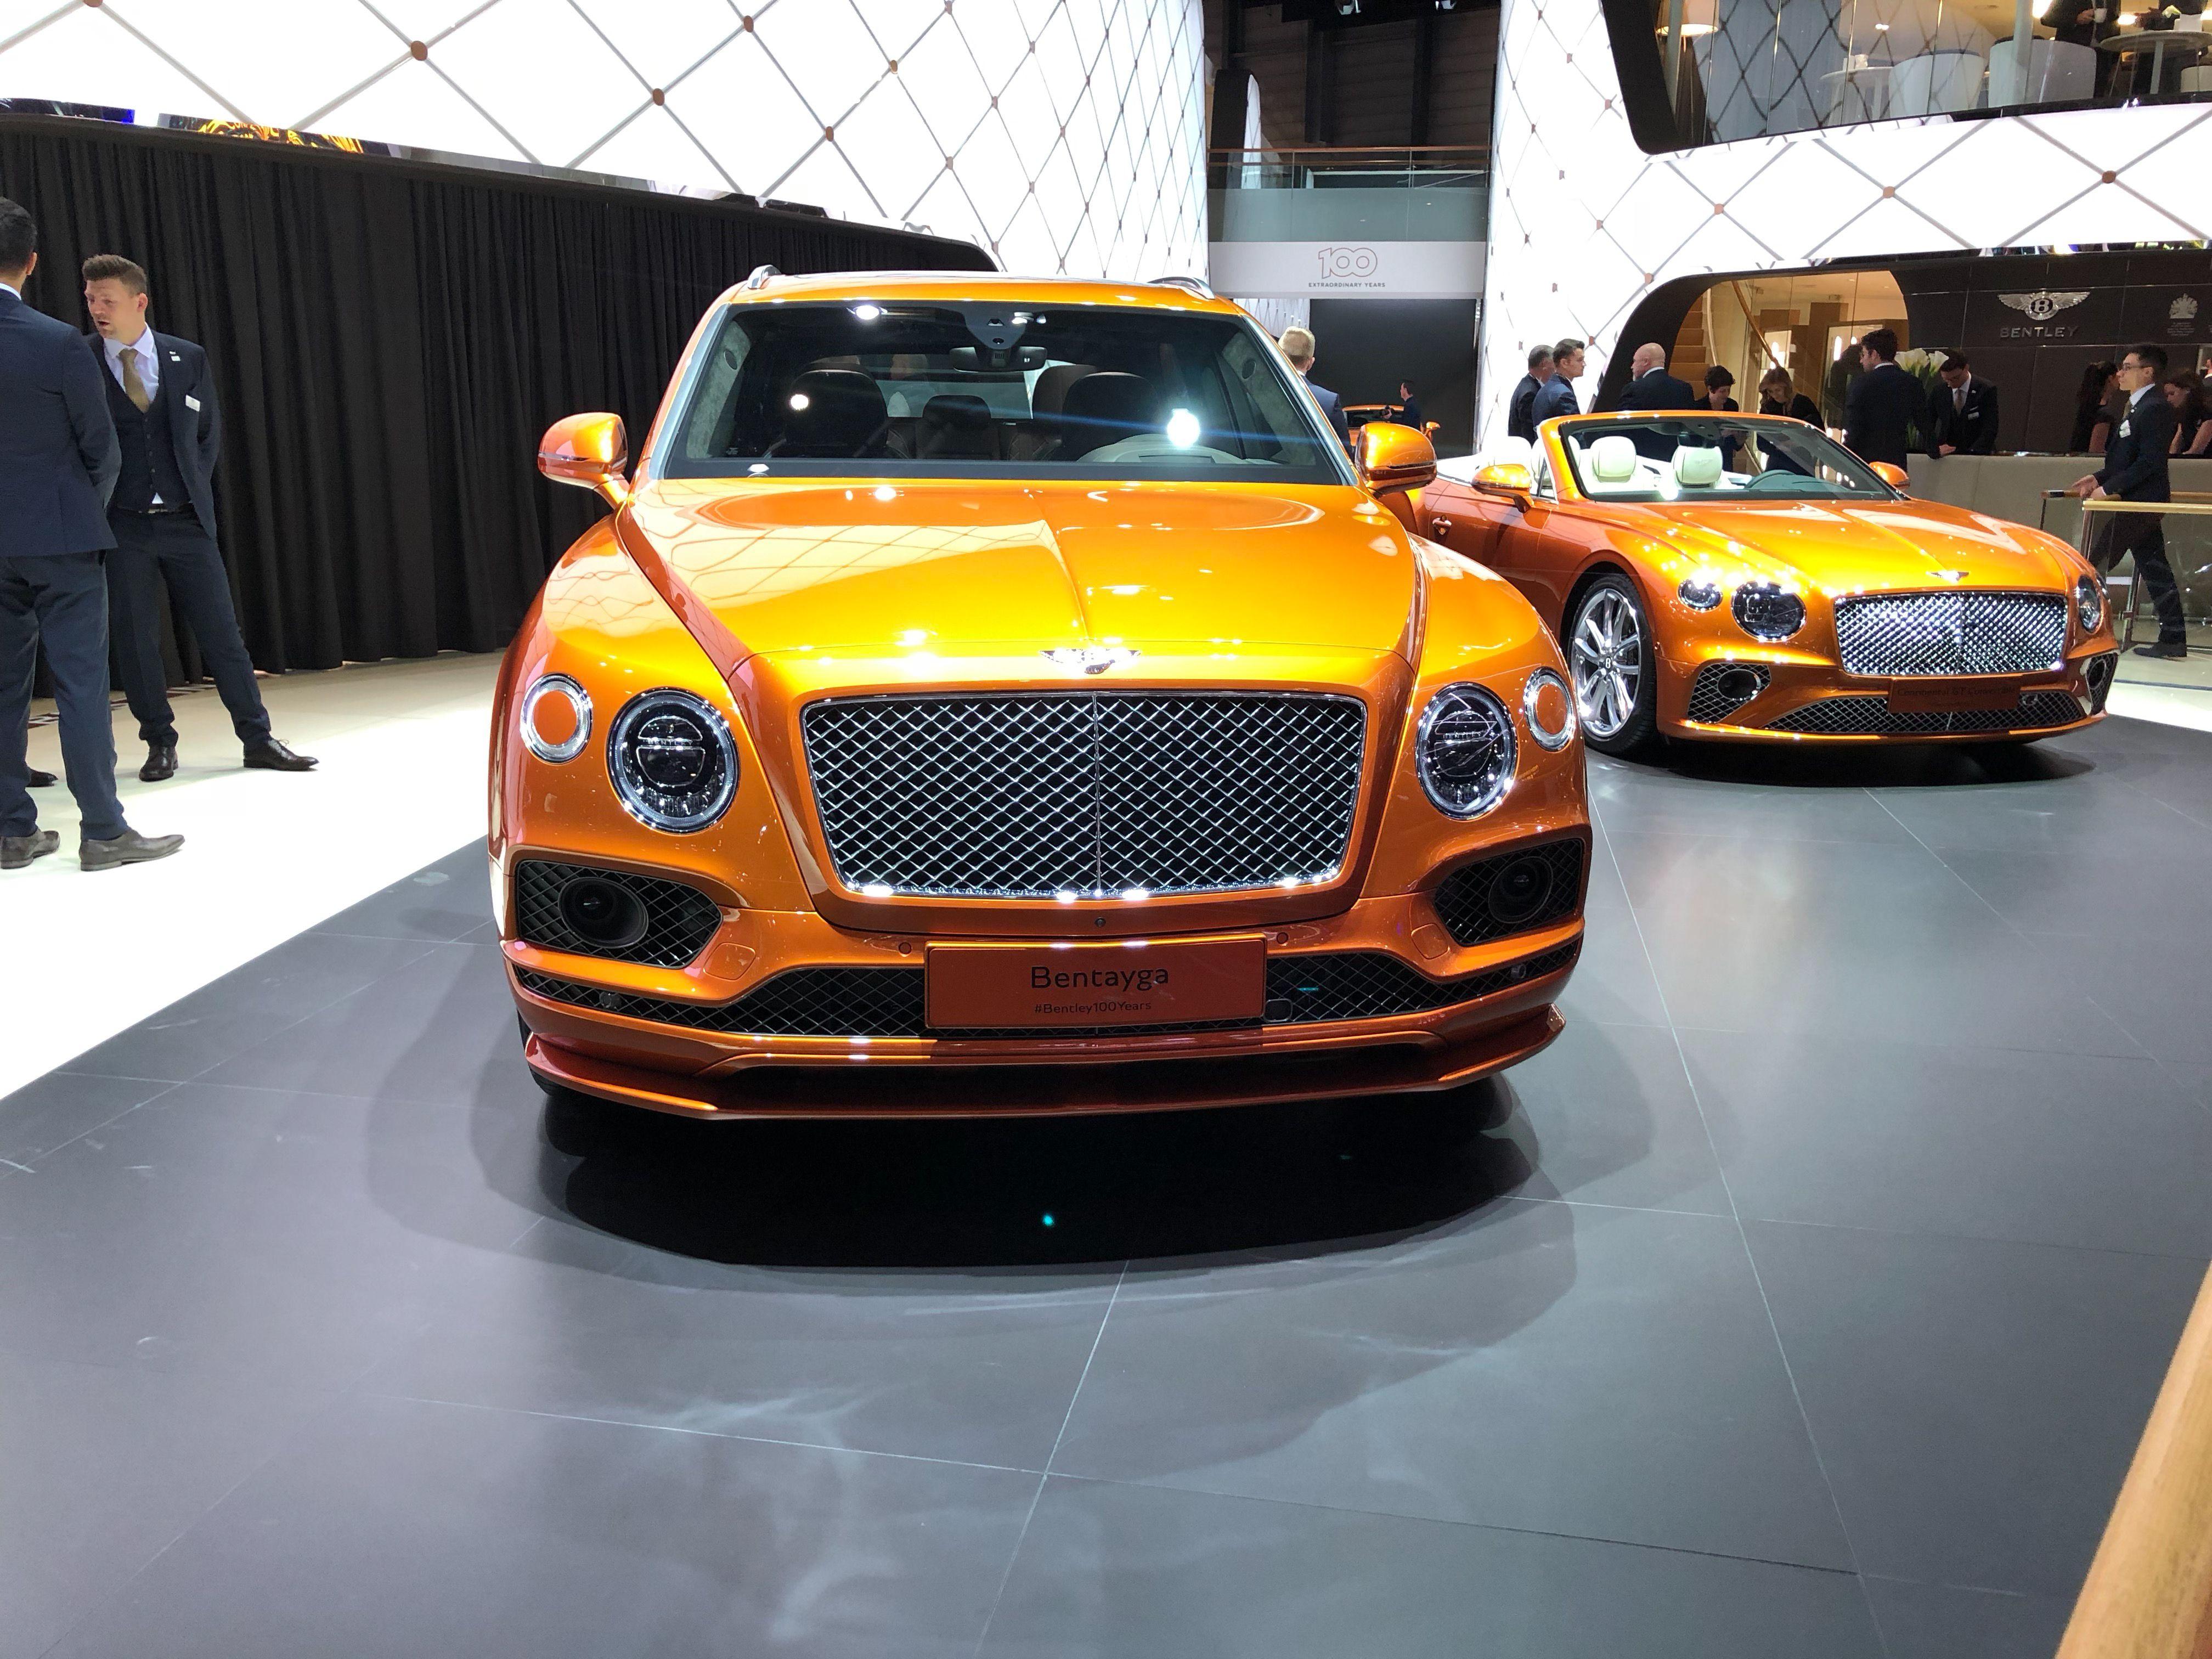 The 2019 Bentley Bentayga Speed One Very Fast Luxurious Suv